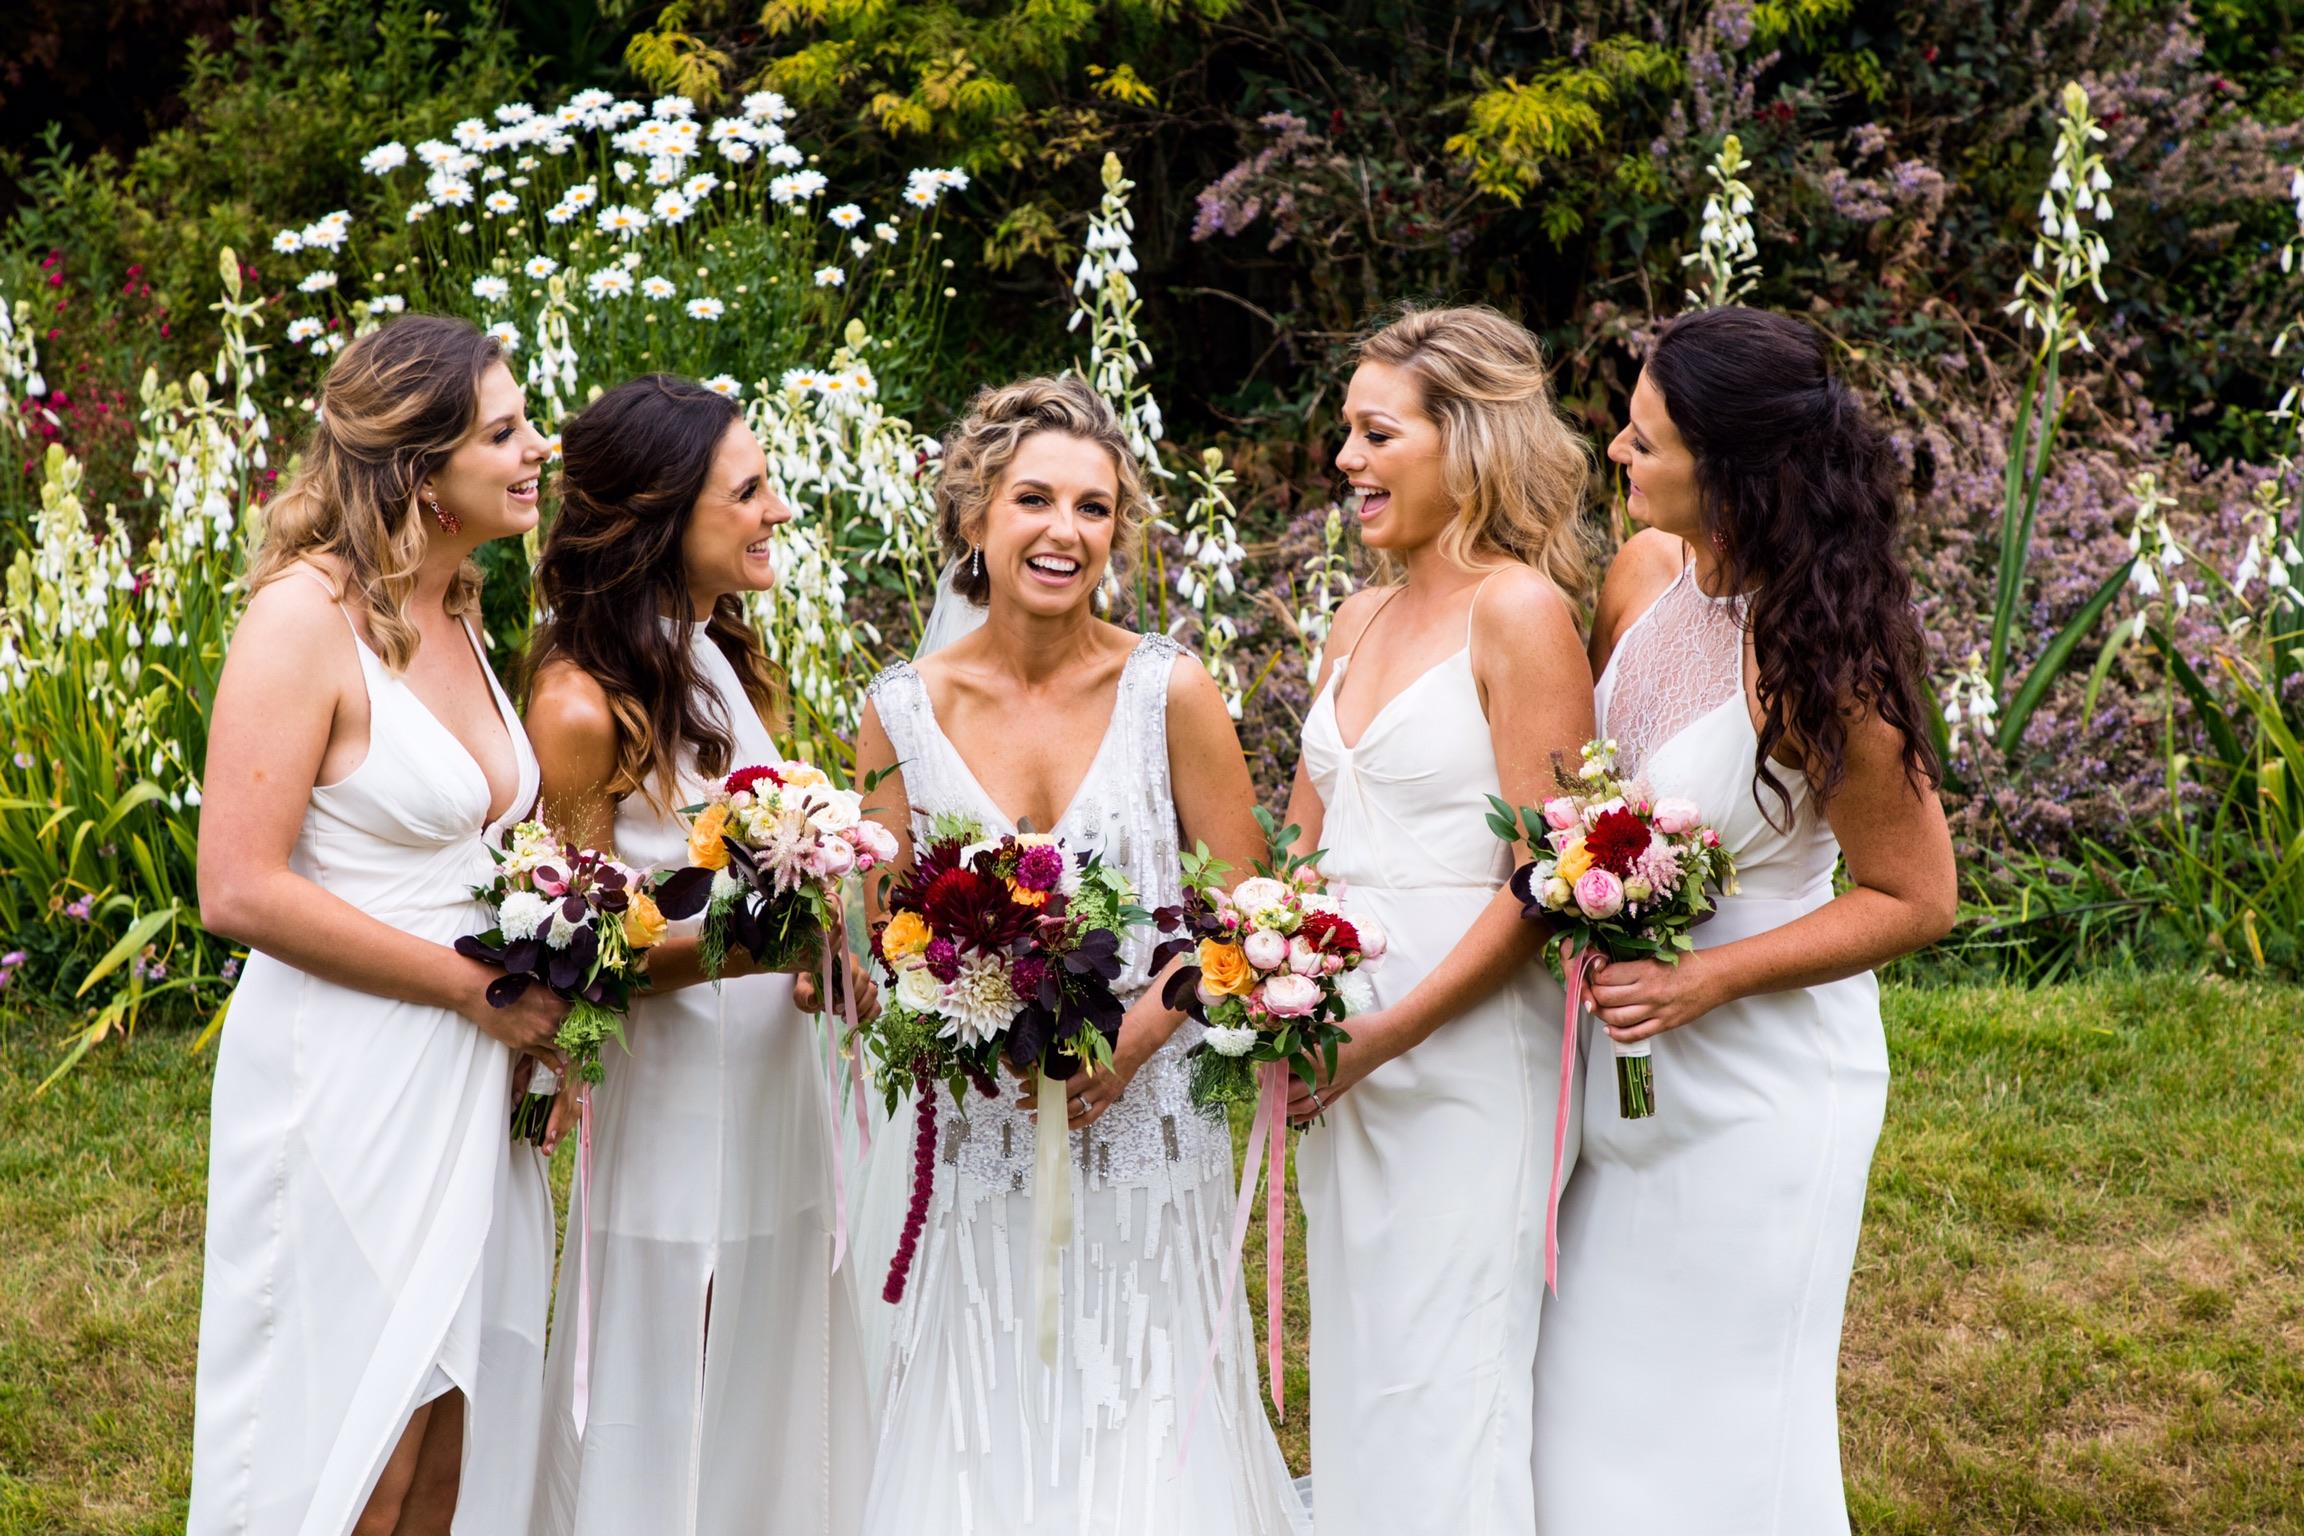 alex wedding 4.jpeg